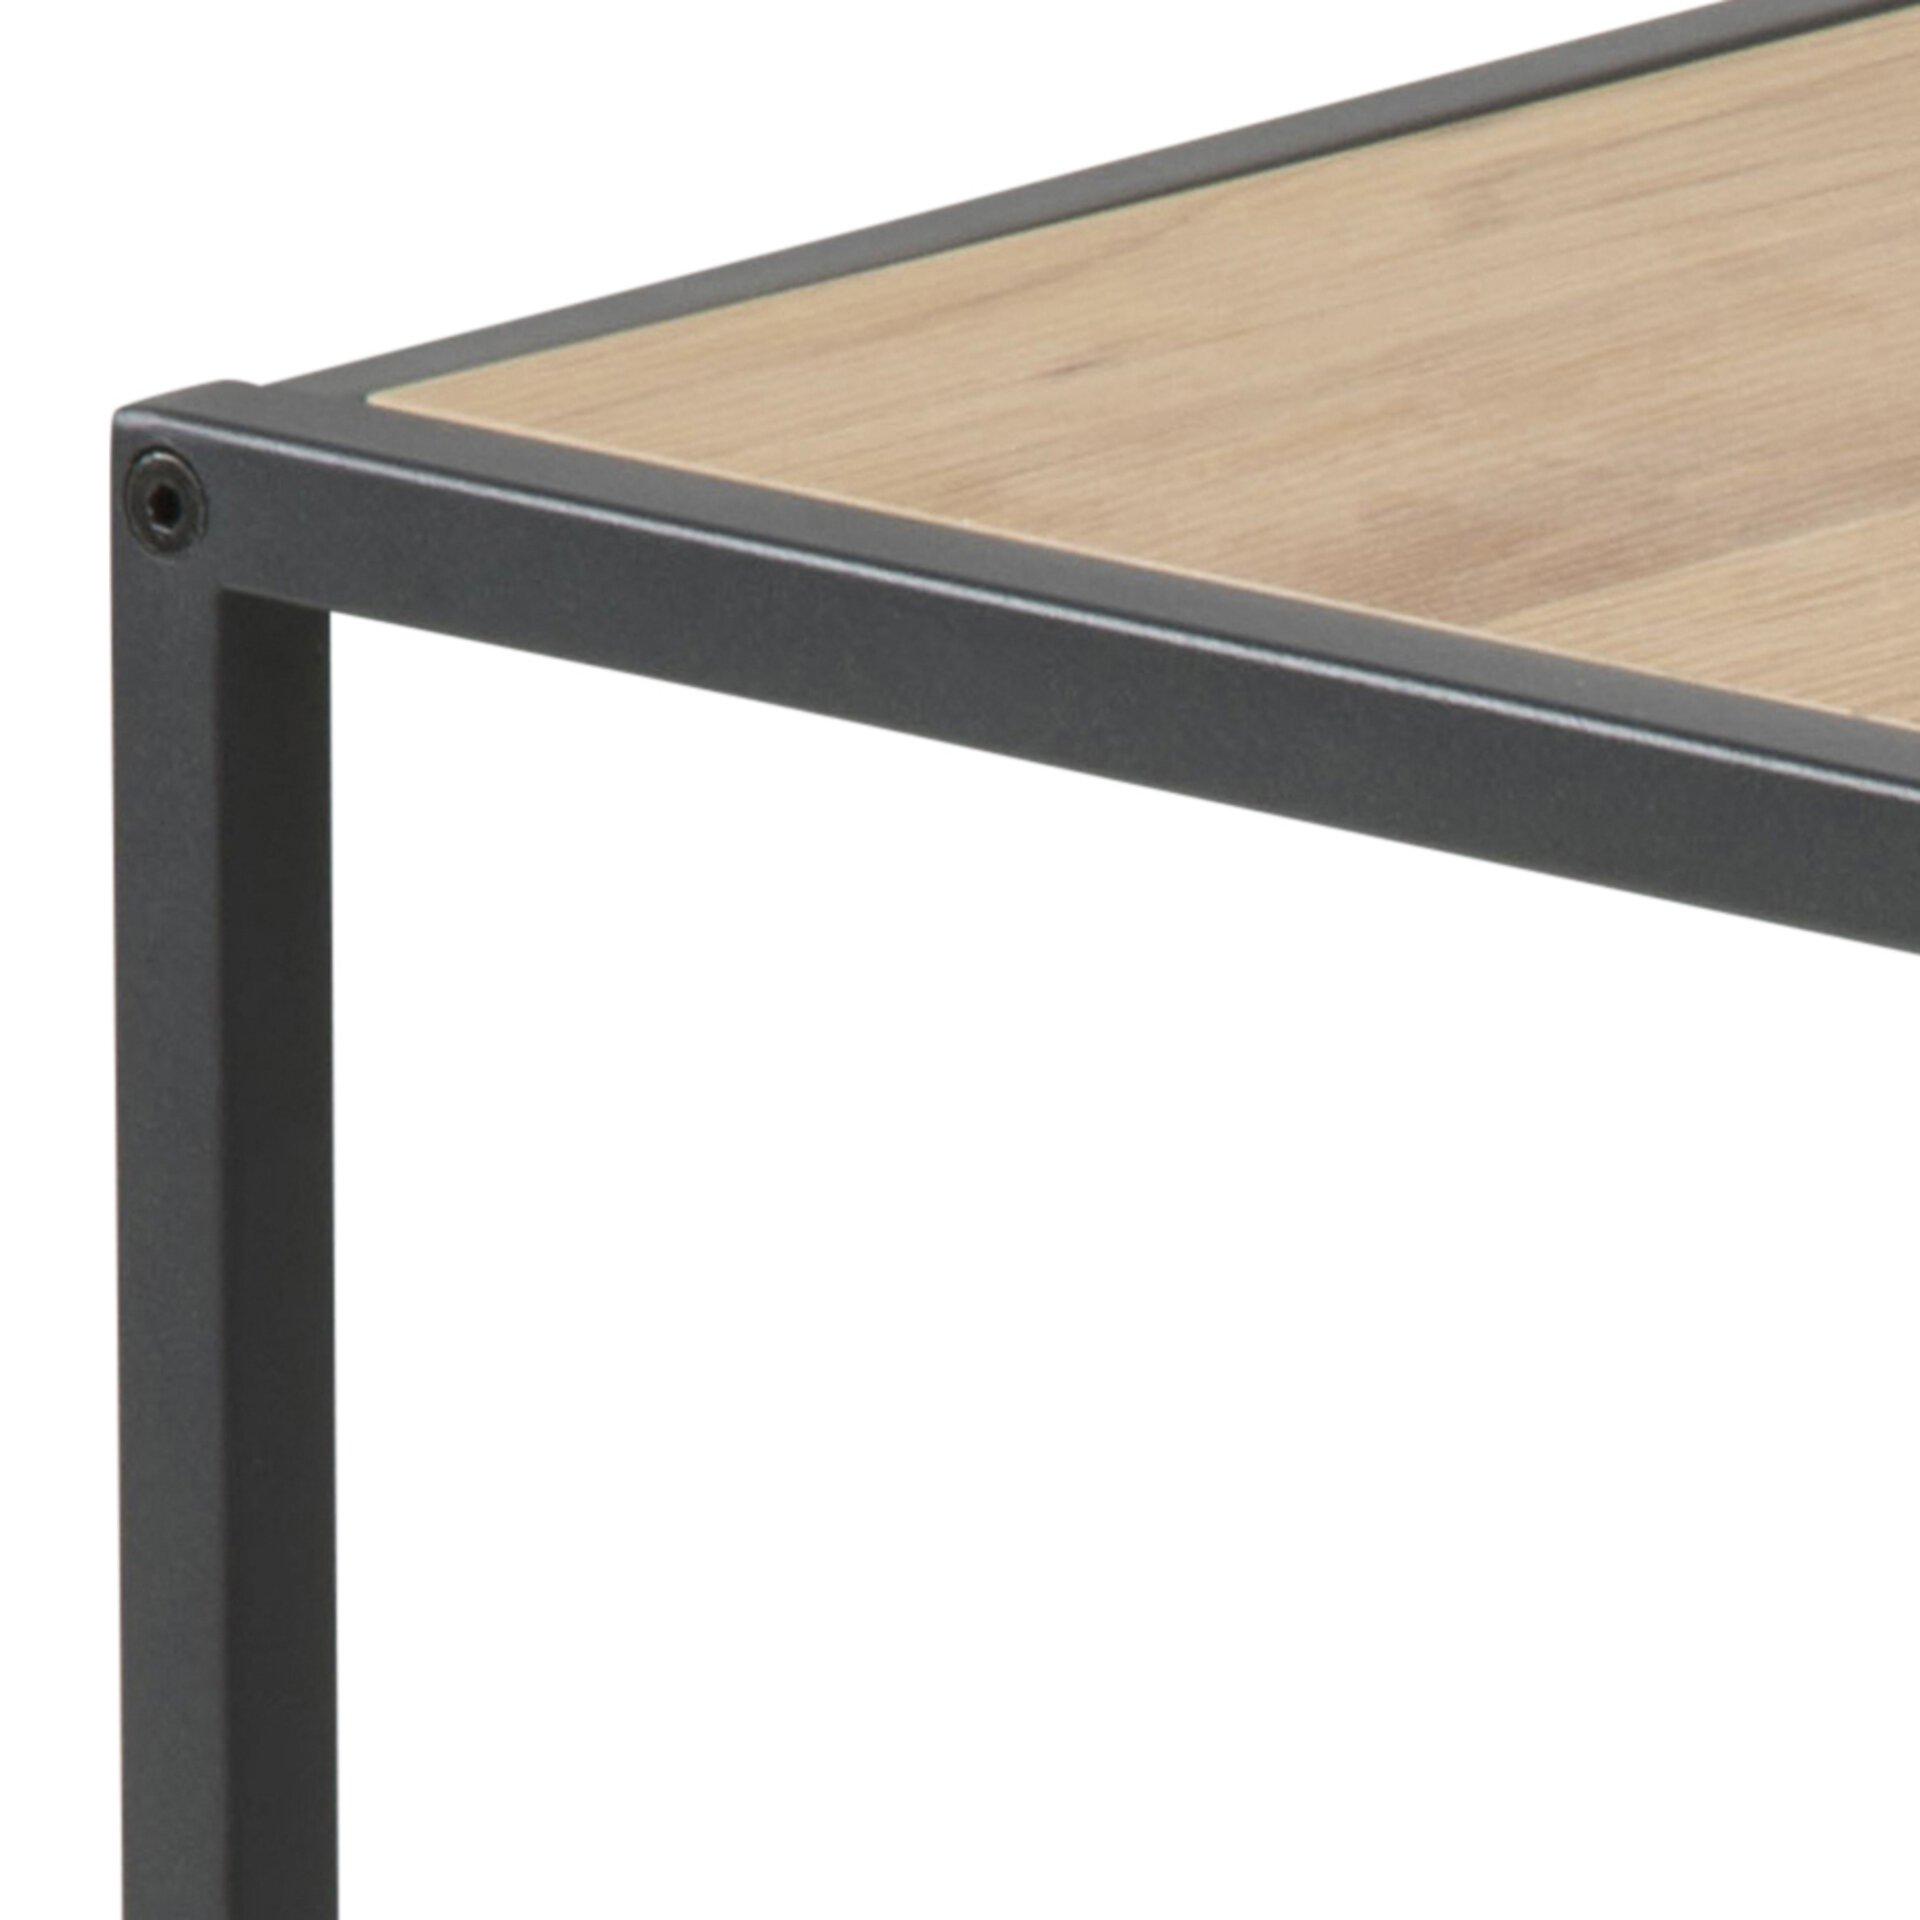 Beistelltisch-Set SEAFORD CELECT Metall mehrfarbig 50 x 45 x 50 cm